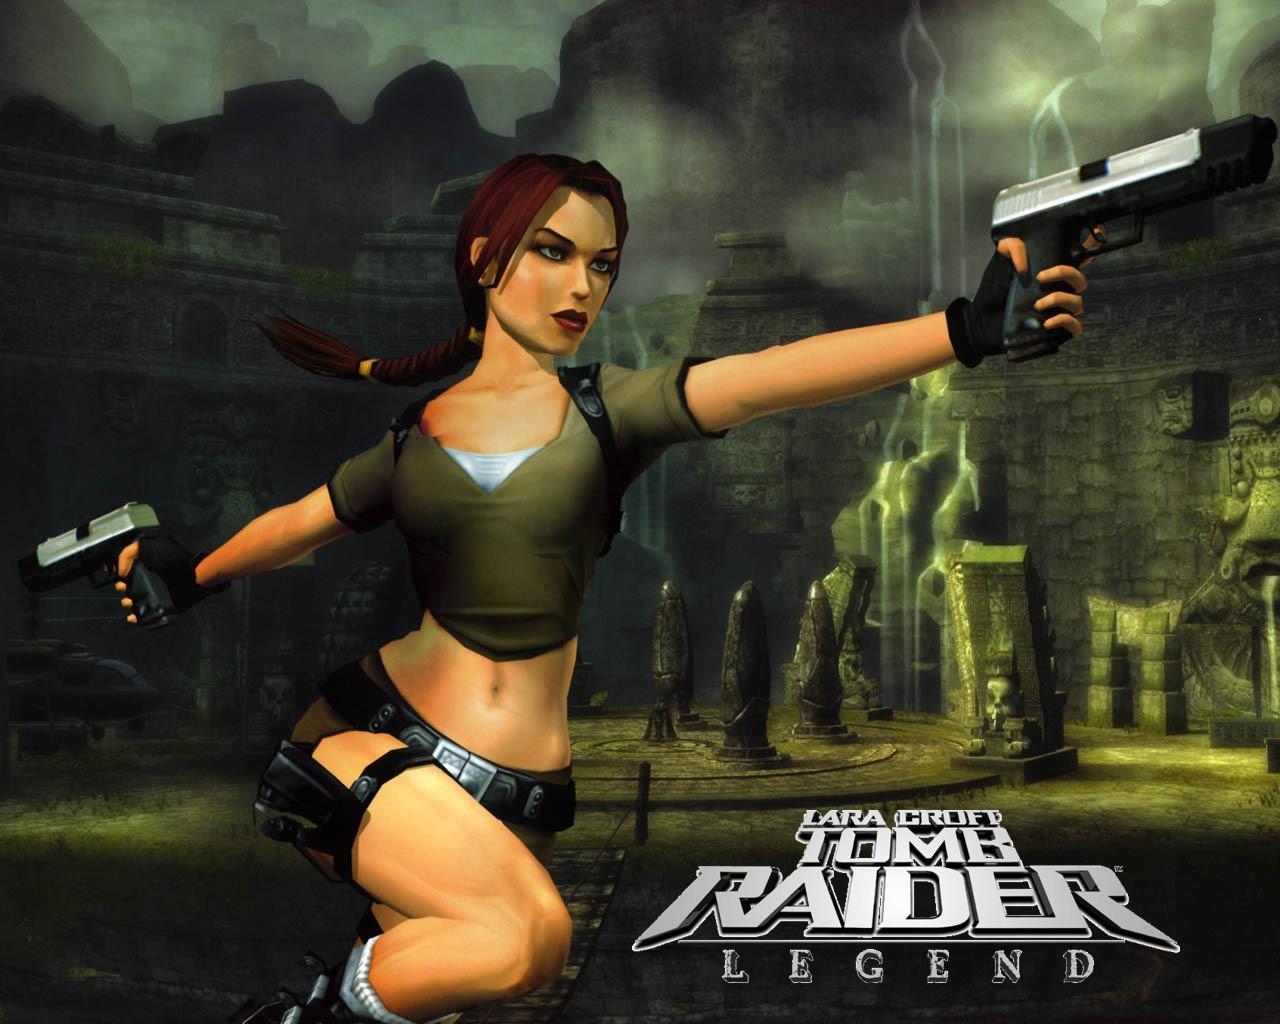 Tomb raider legend nude xbox nackt fetish girls